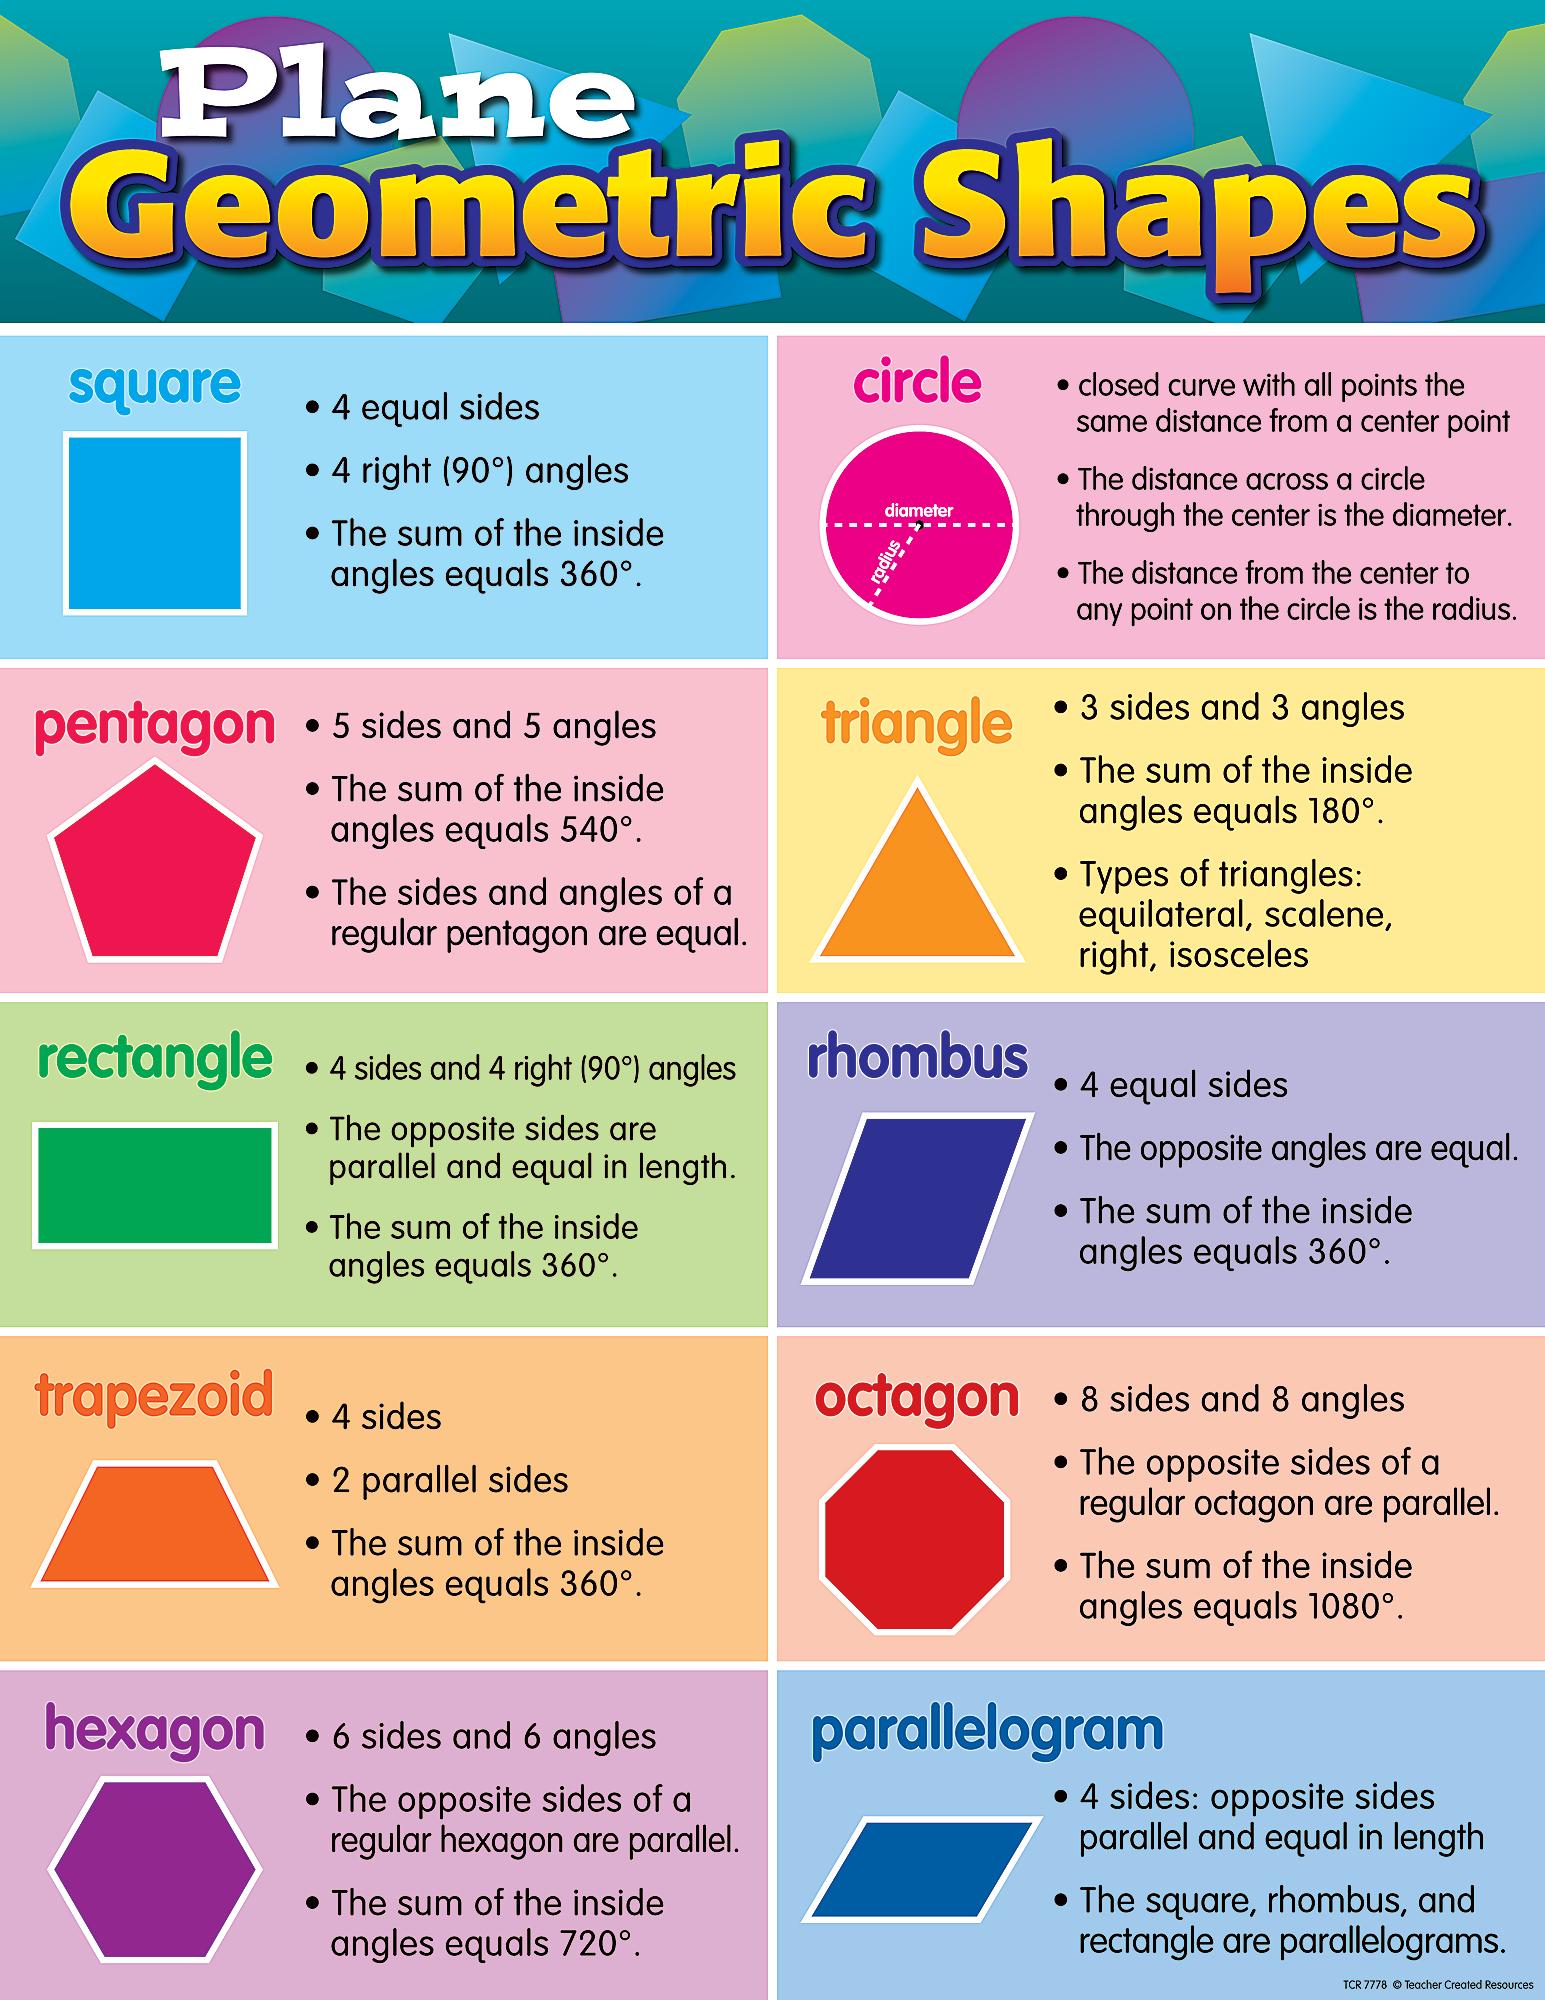 Plane Geometric Shapes Chart